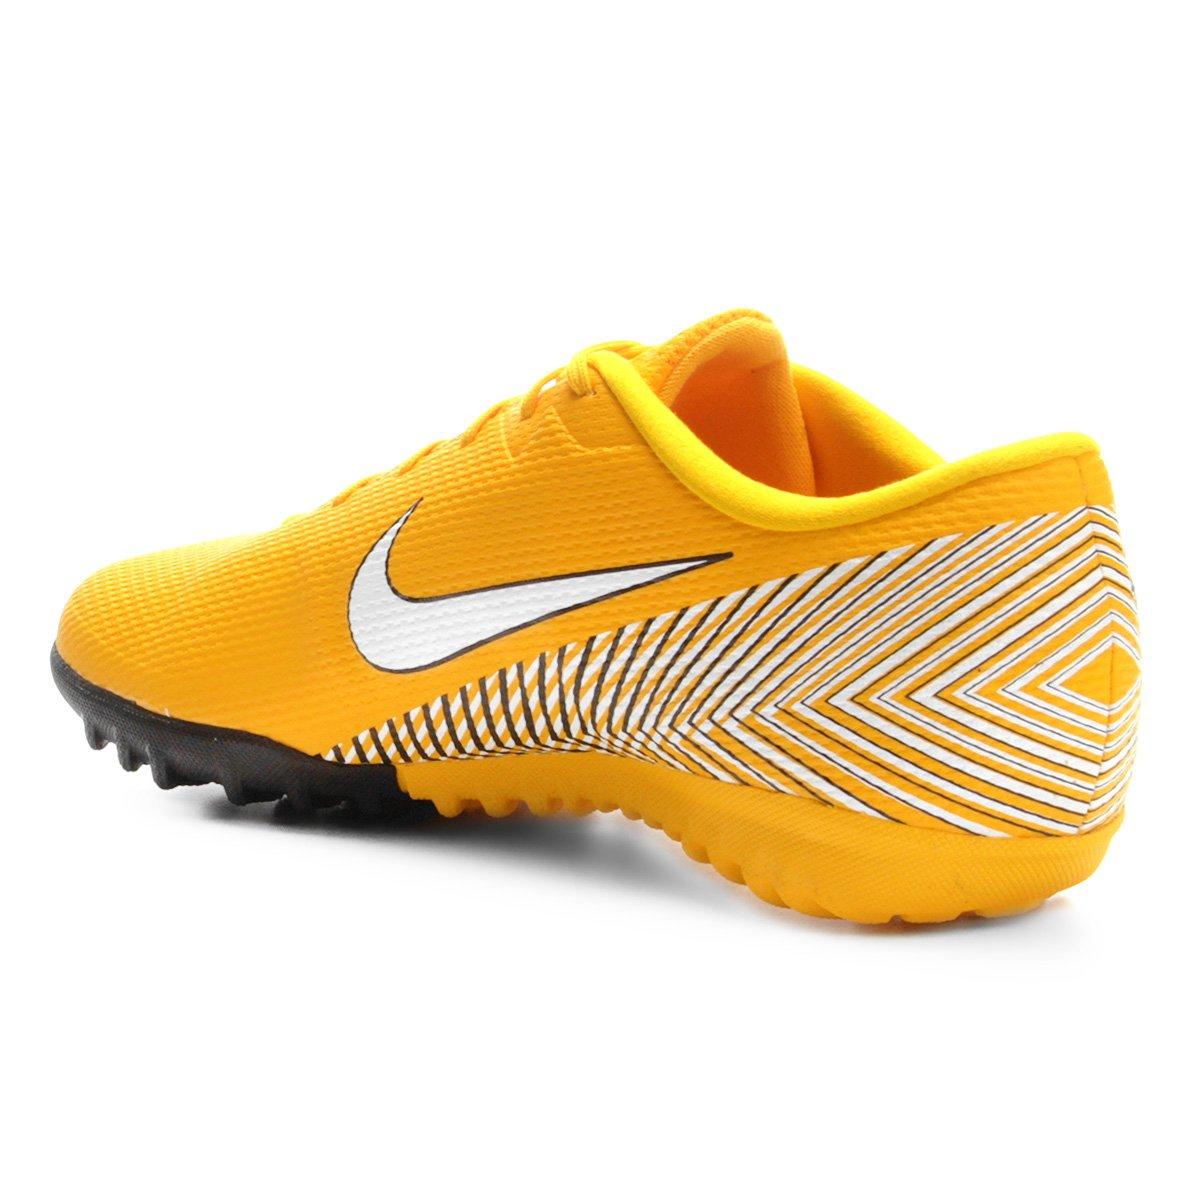 Chuteira Society Nike Mercurial Vapor 12 Academy Neymar TF - Amarelo ... cf4834929f5b2